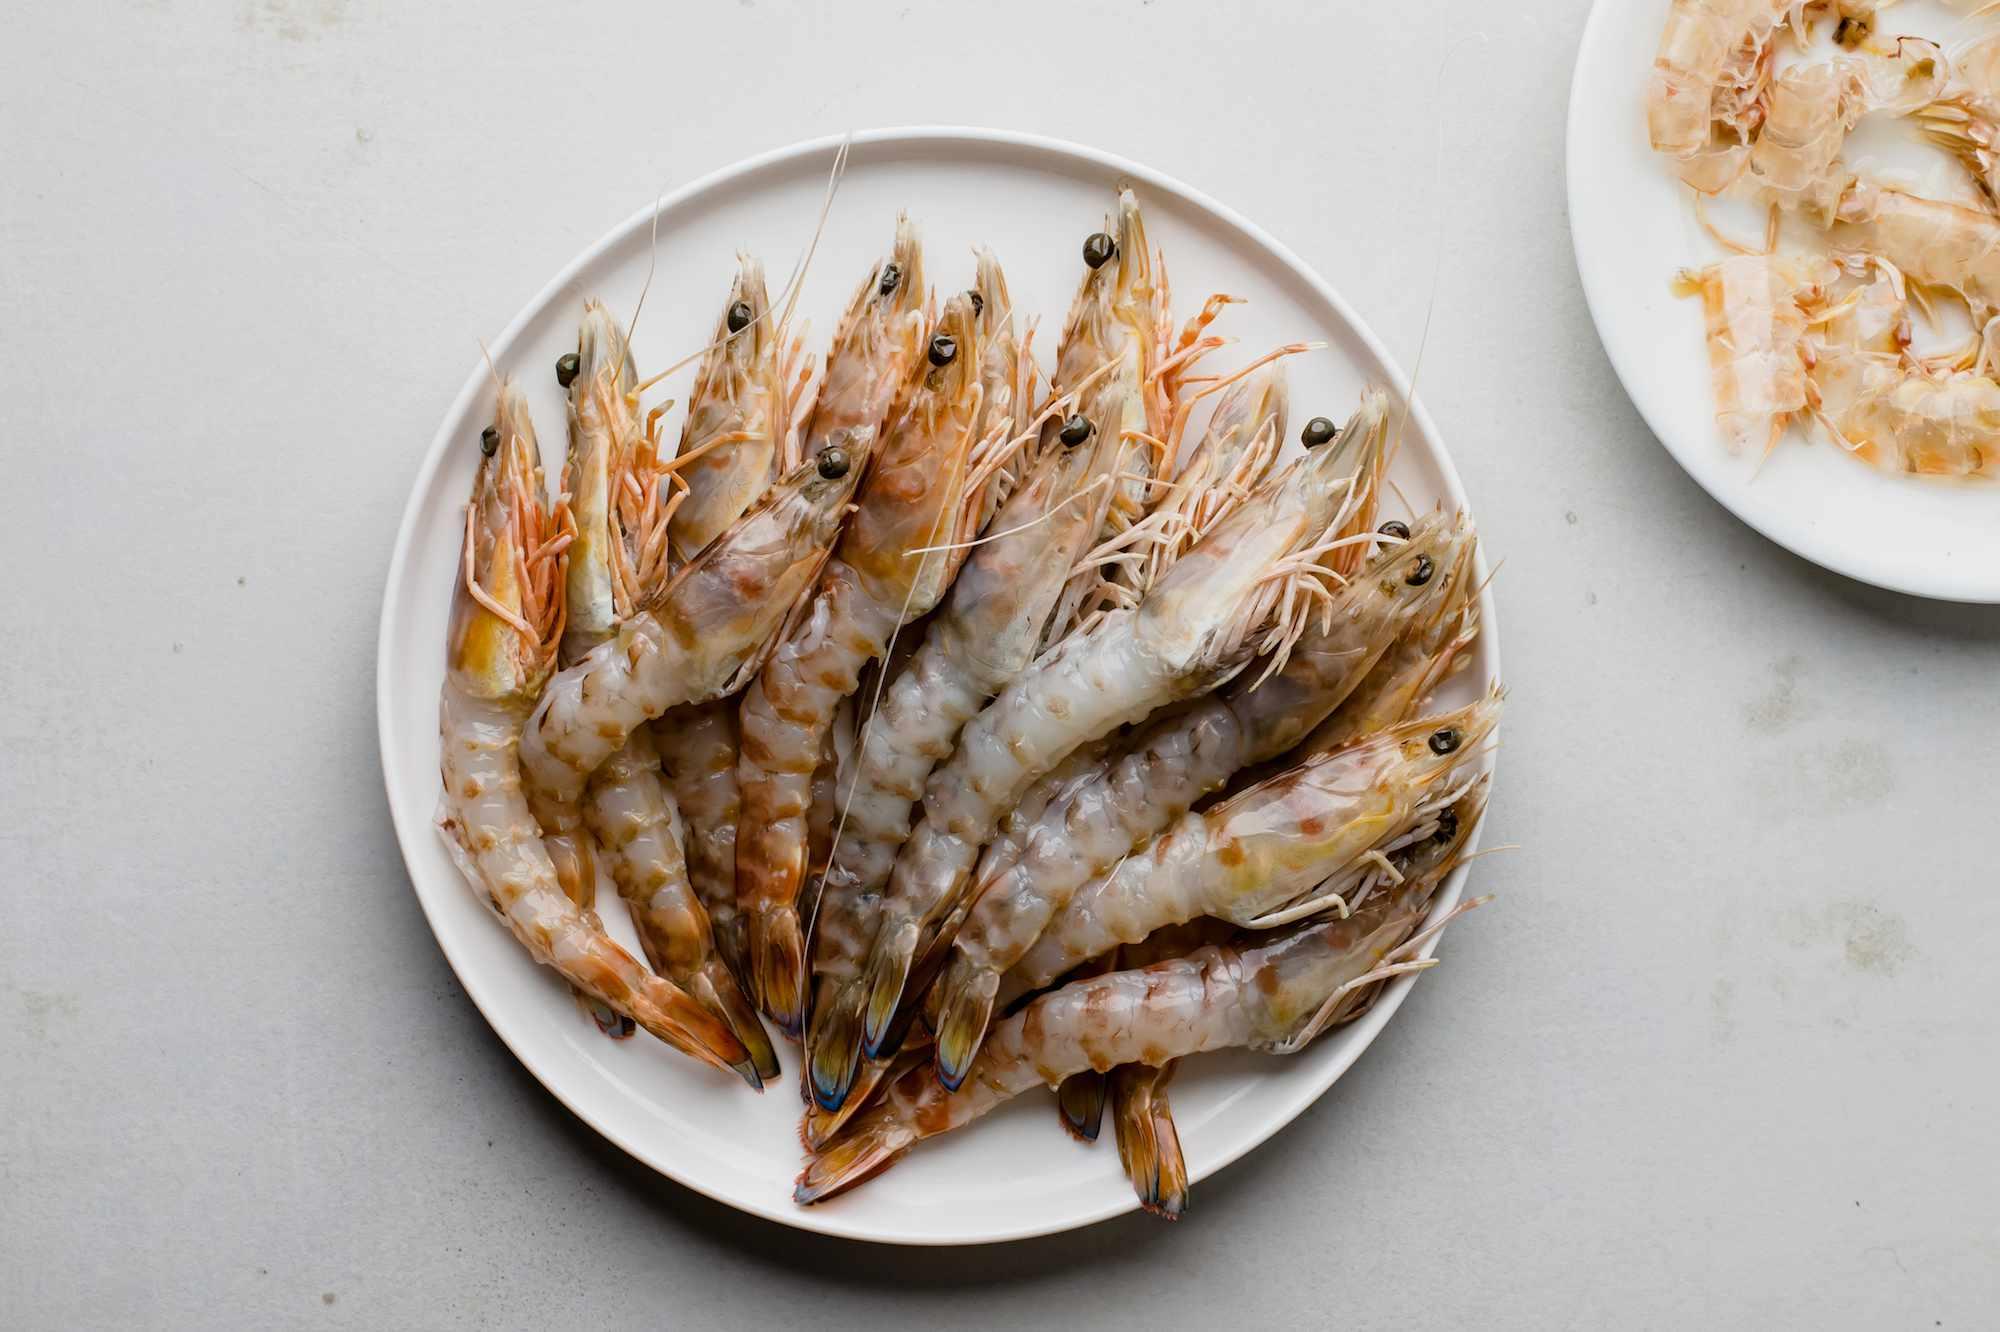 Prepared prawns on a plate